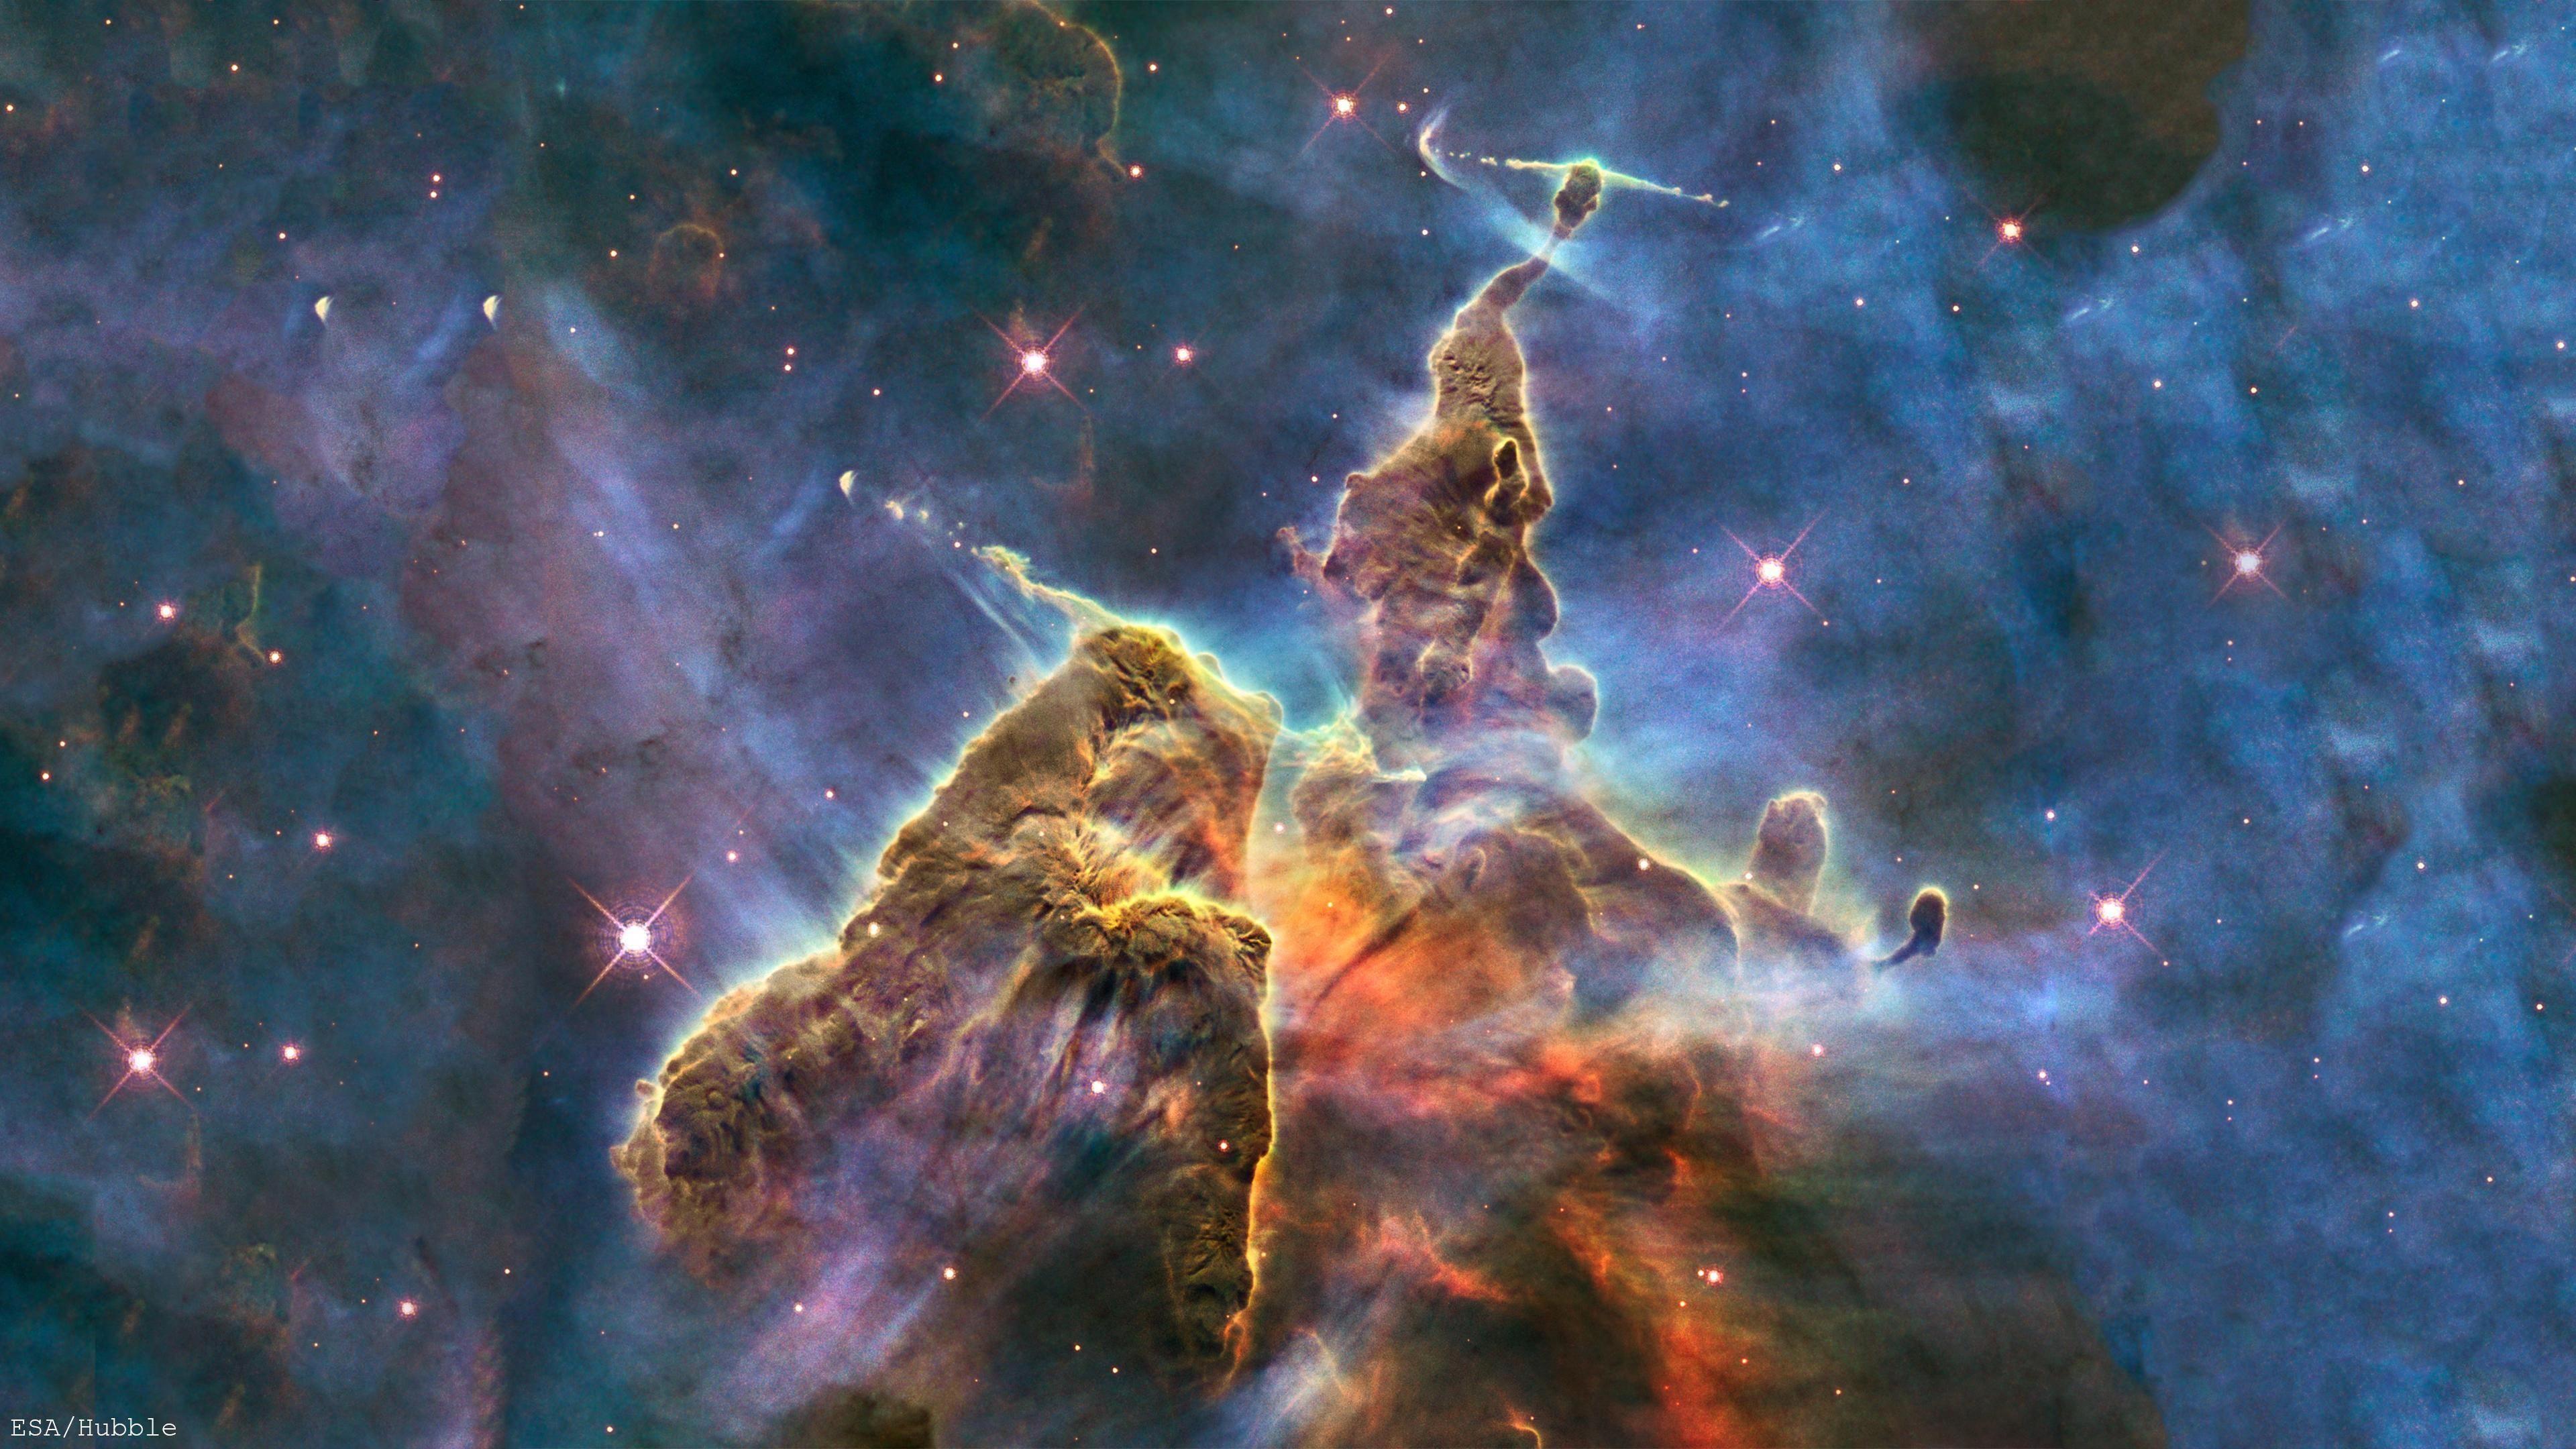 4k Carina Nebula Hubble Telescope Hubble Space Telescope Hubble Telescope Hubble